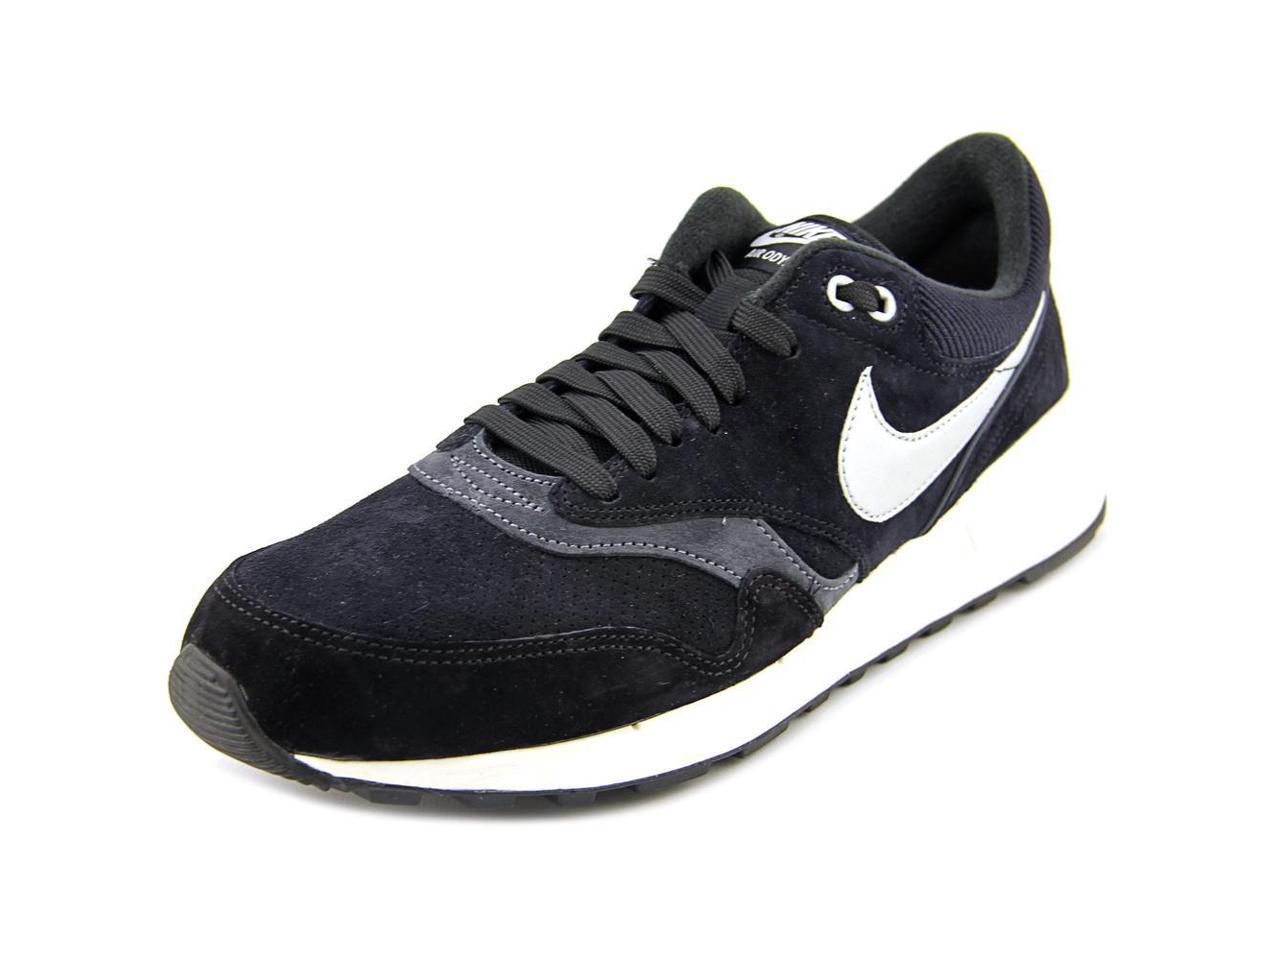 Nike Air Odyssey LTR Sneakers Men US 11 Black Sneakers LTR 6c063f